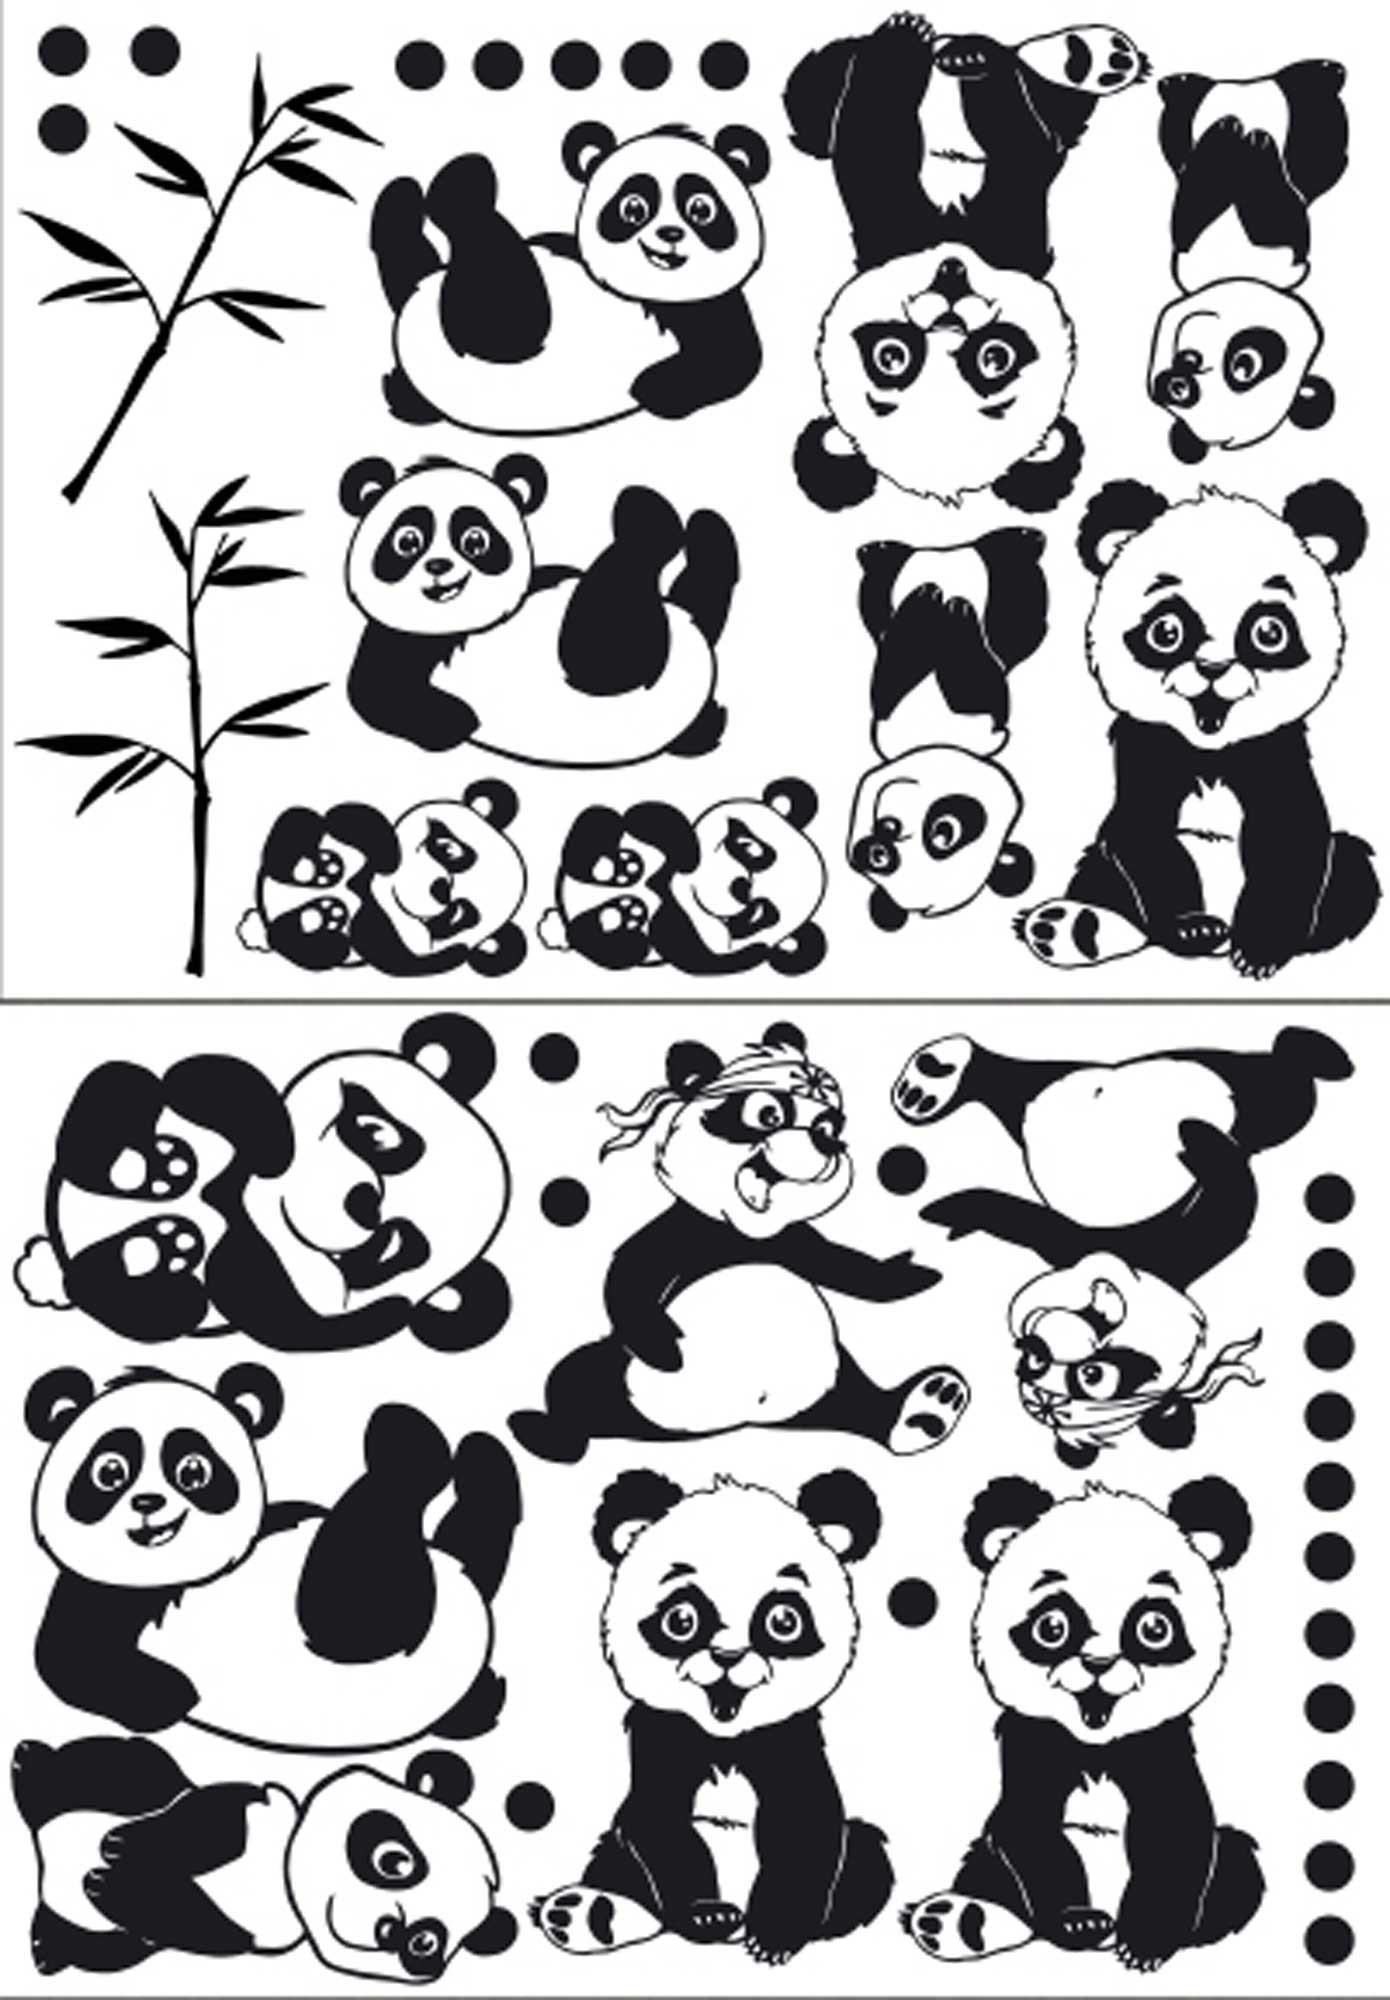 aufkleber sticker glassticker partyaufkleber pandas mit. Black Bedroom Furniture Sets. Home Design Ideas